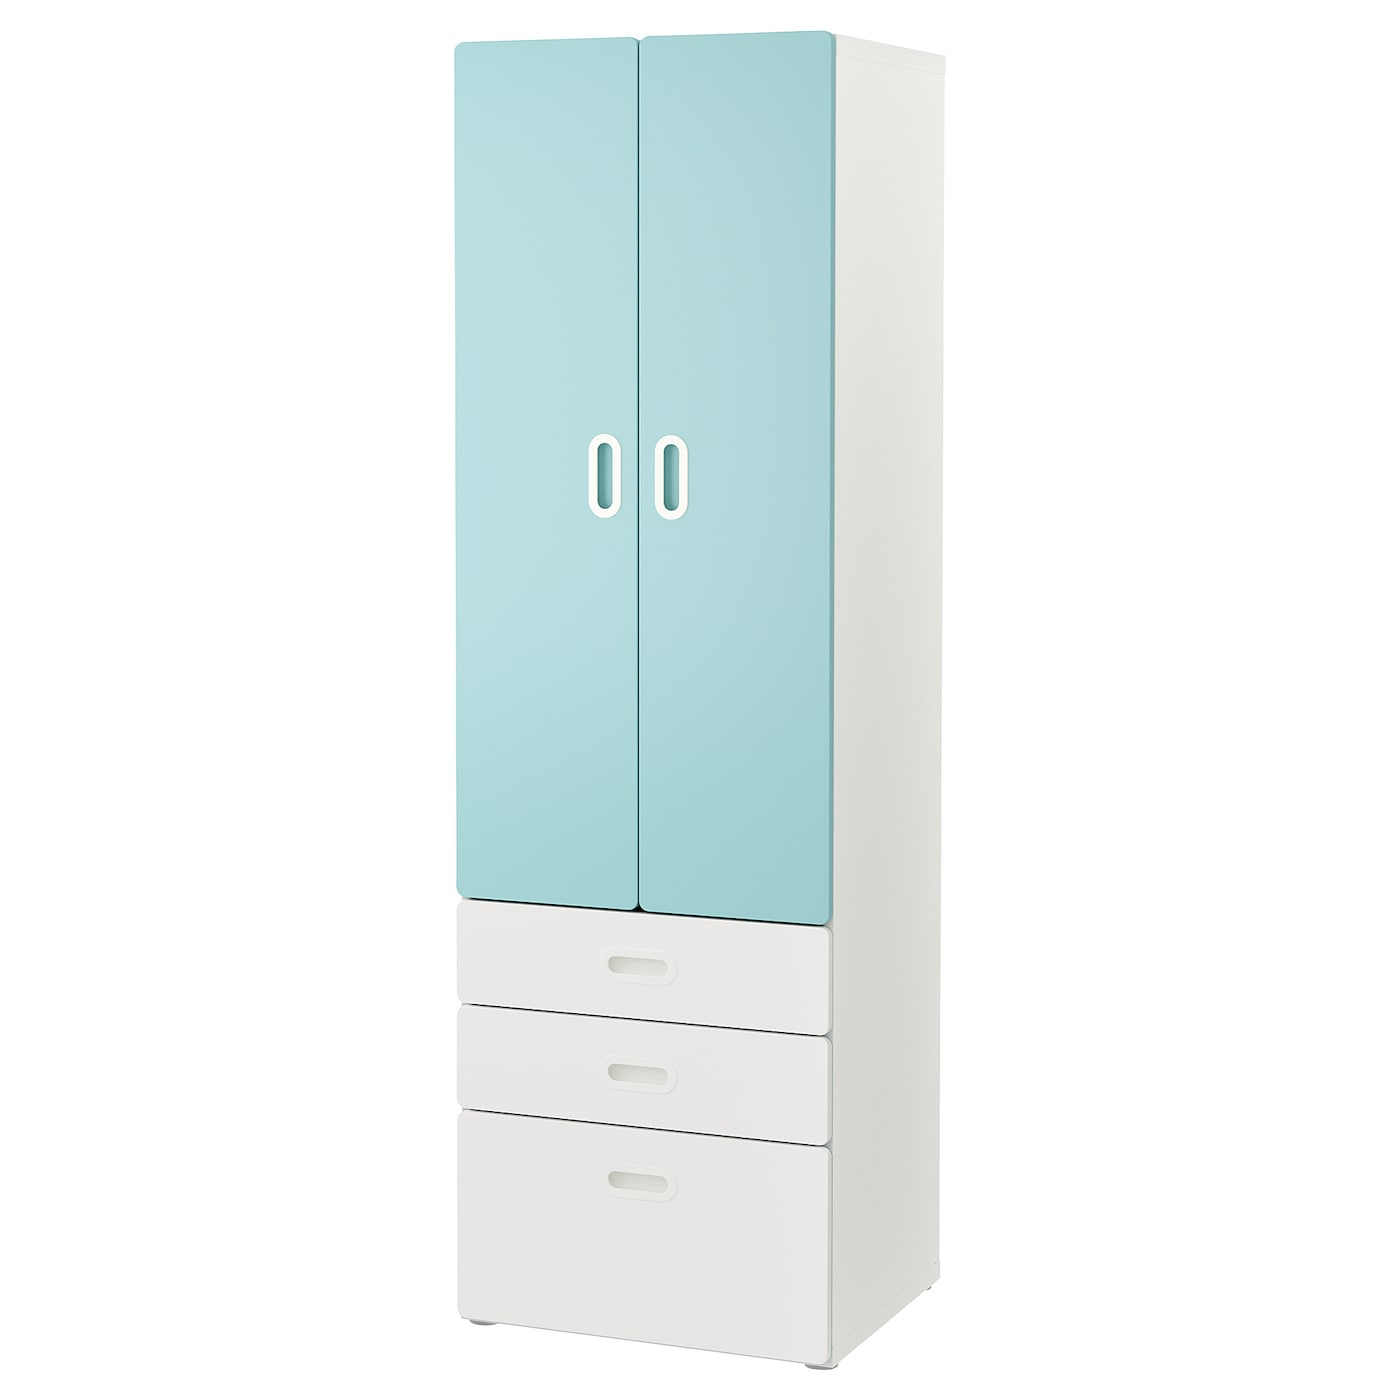 IKEA STUVA / FRITIDS Szafa, biały, jasnoniebieski, 60x50x192 cm